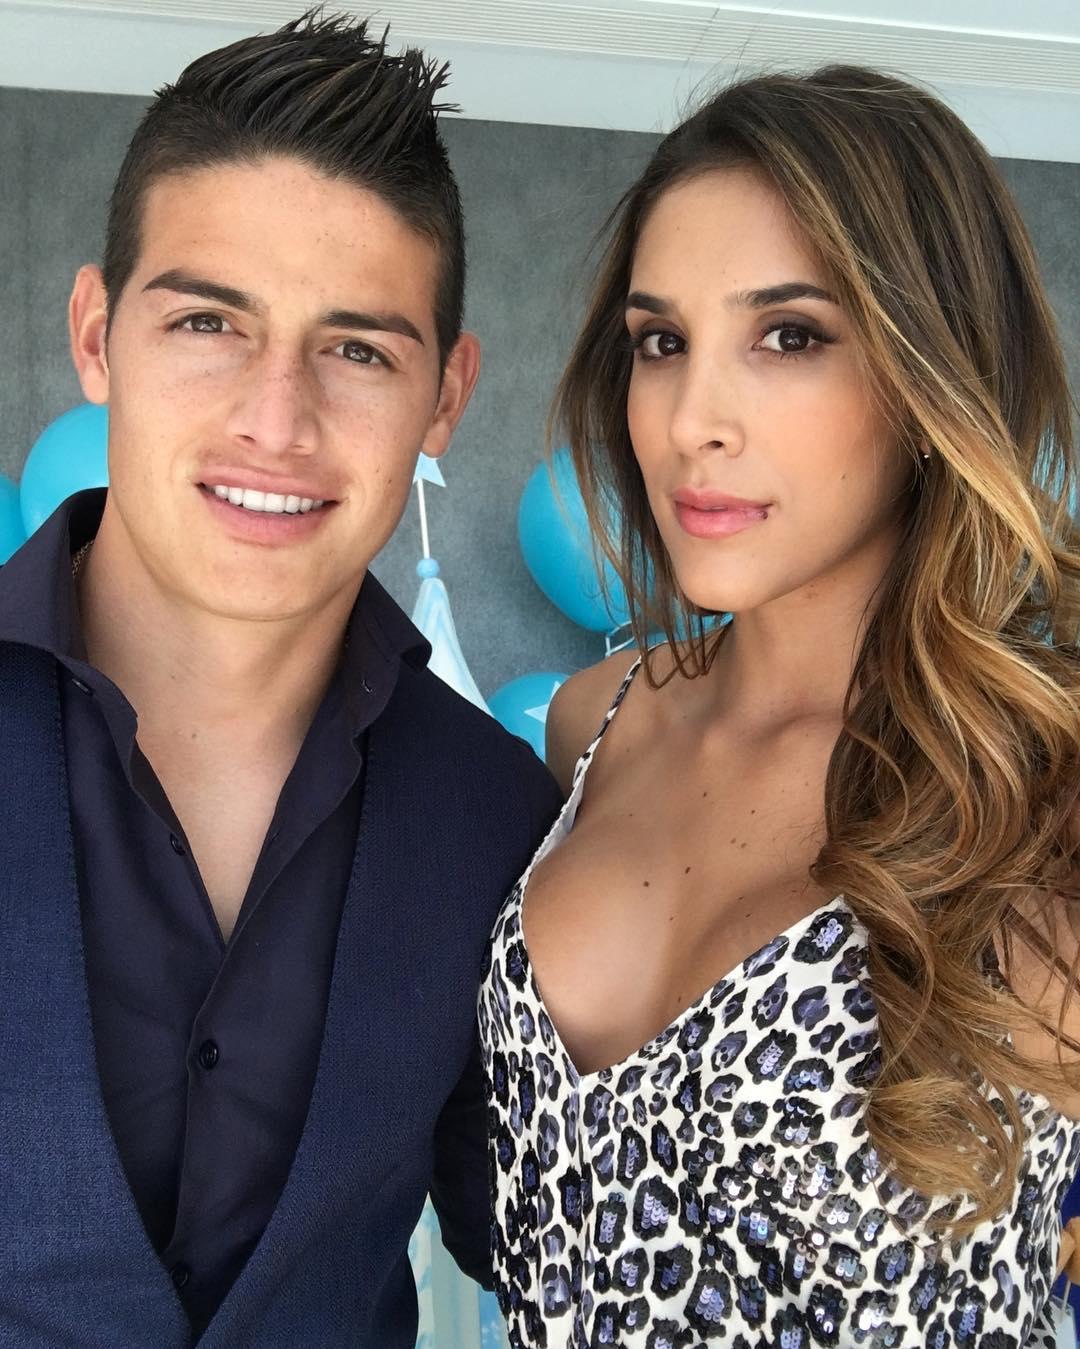 Daniela Ospina y James Rodríguez se separan